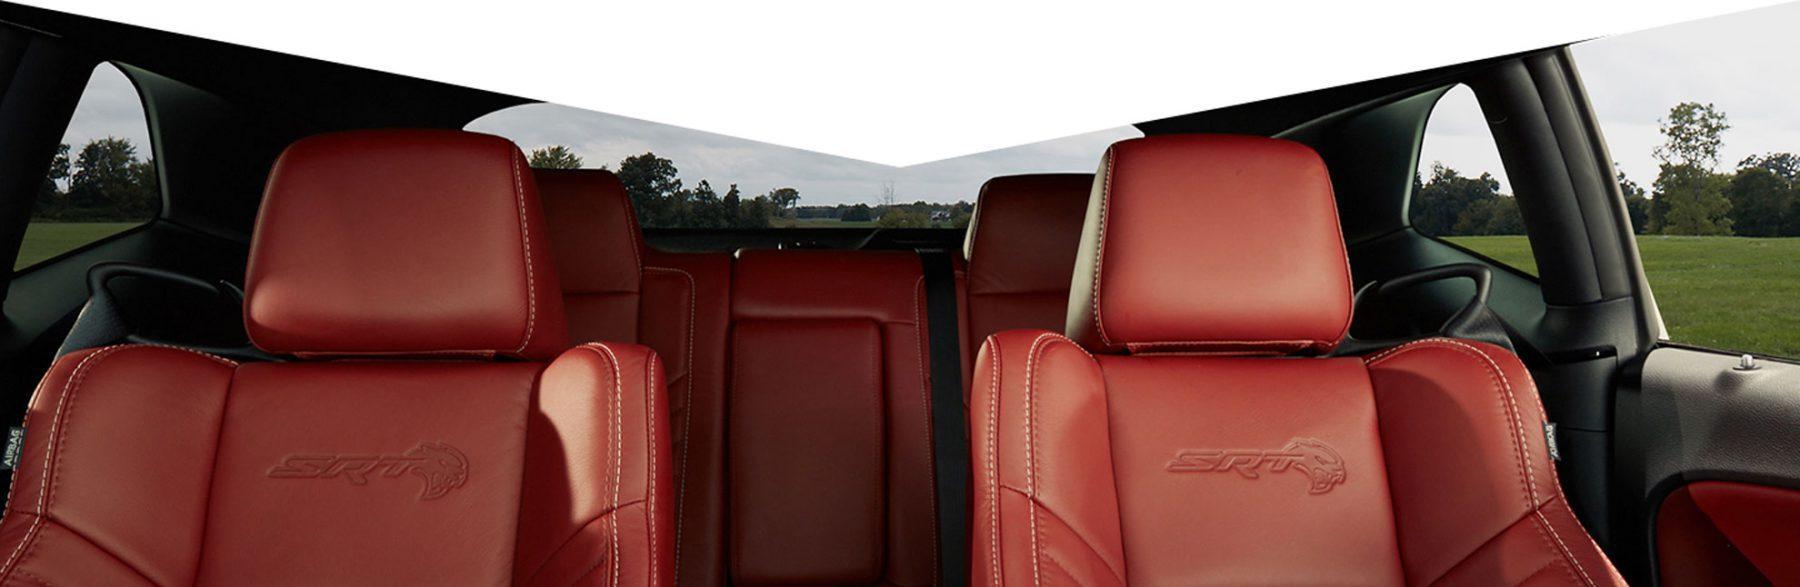 Logo laguna leather seats